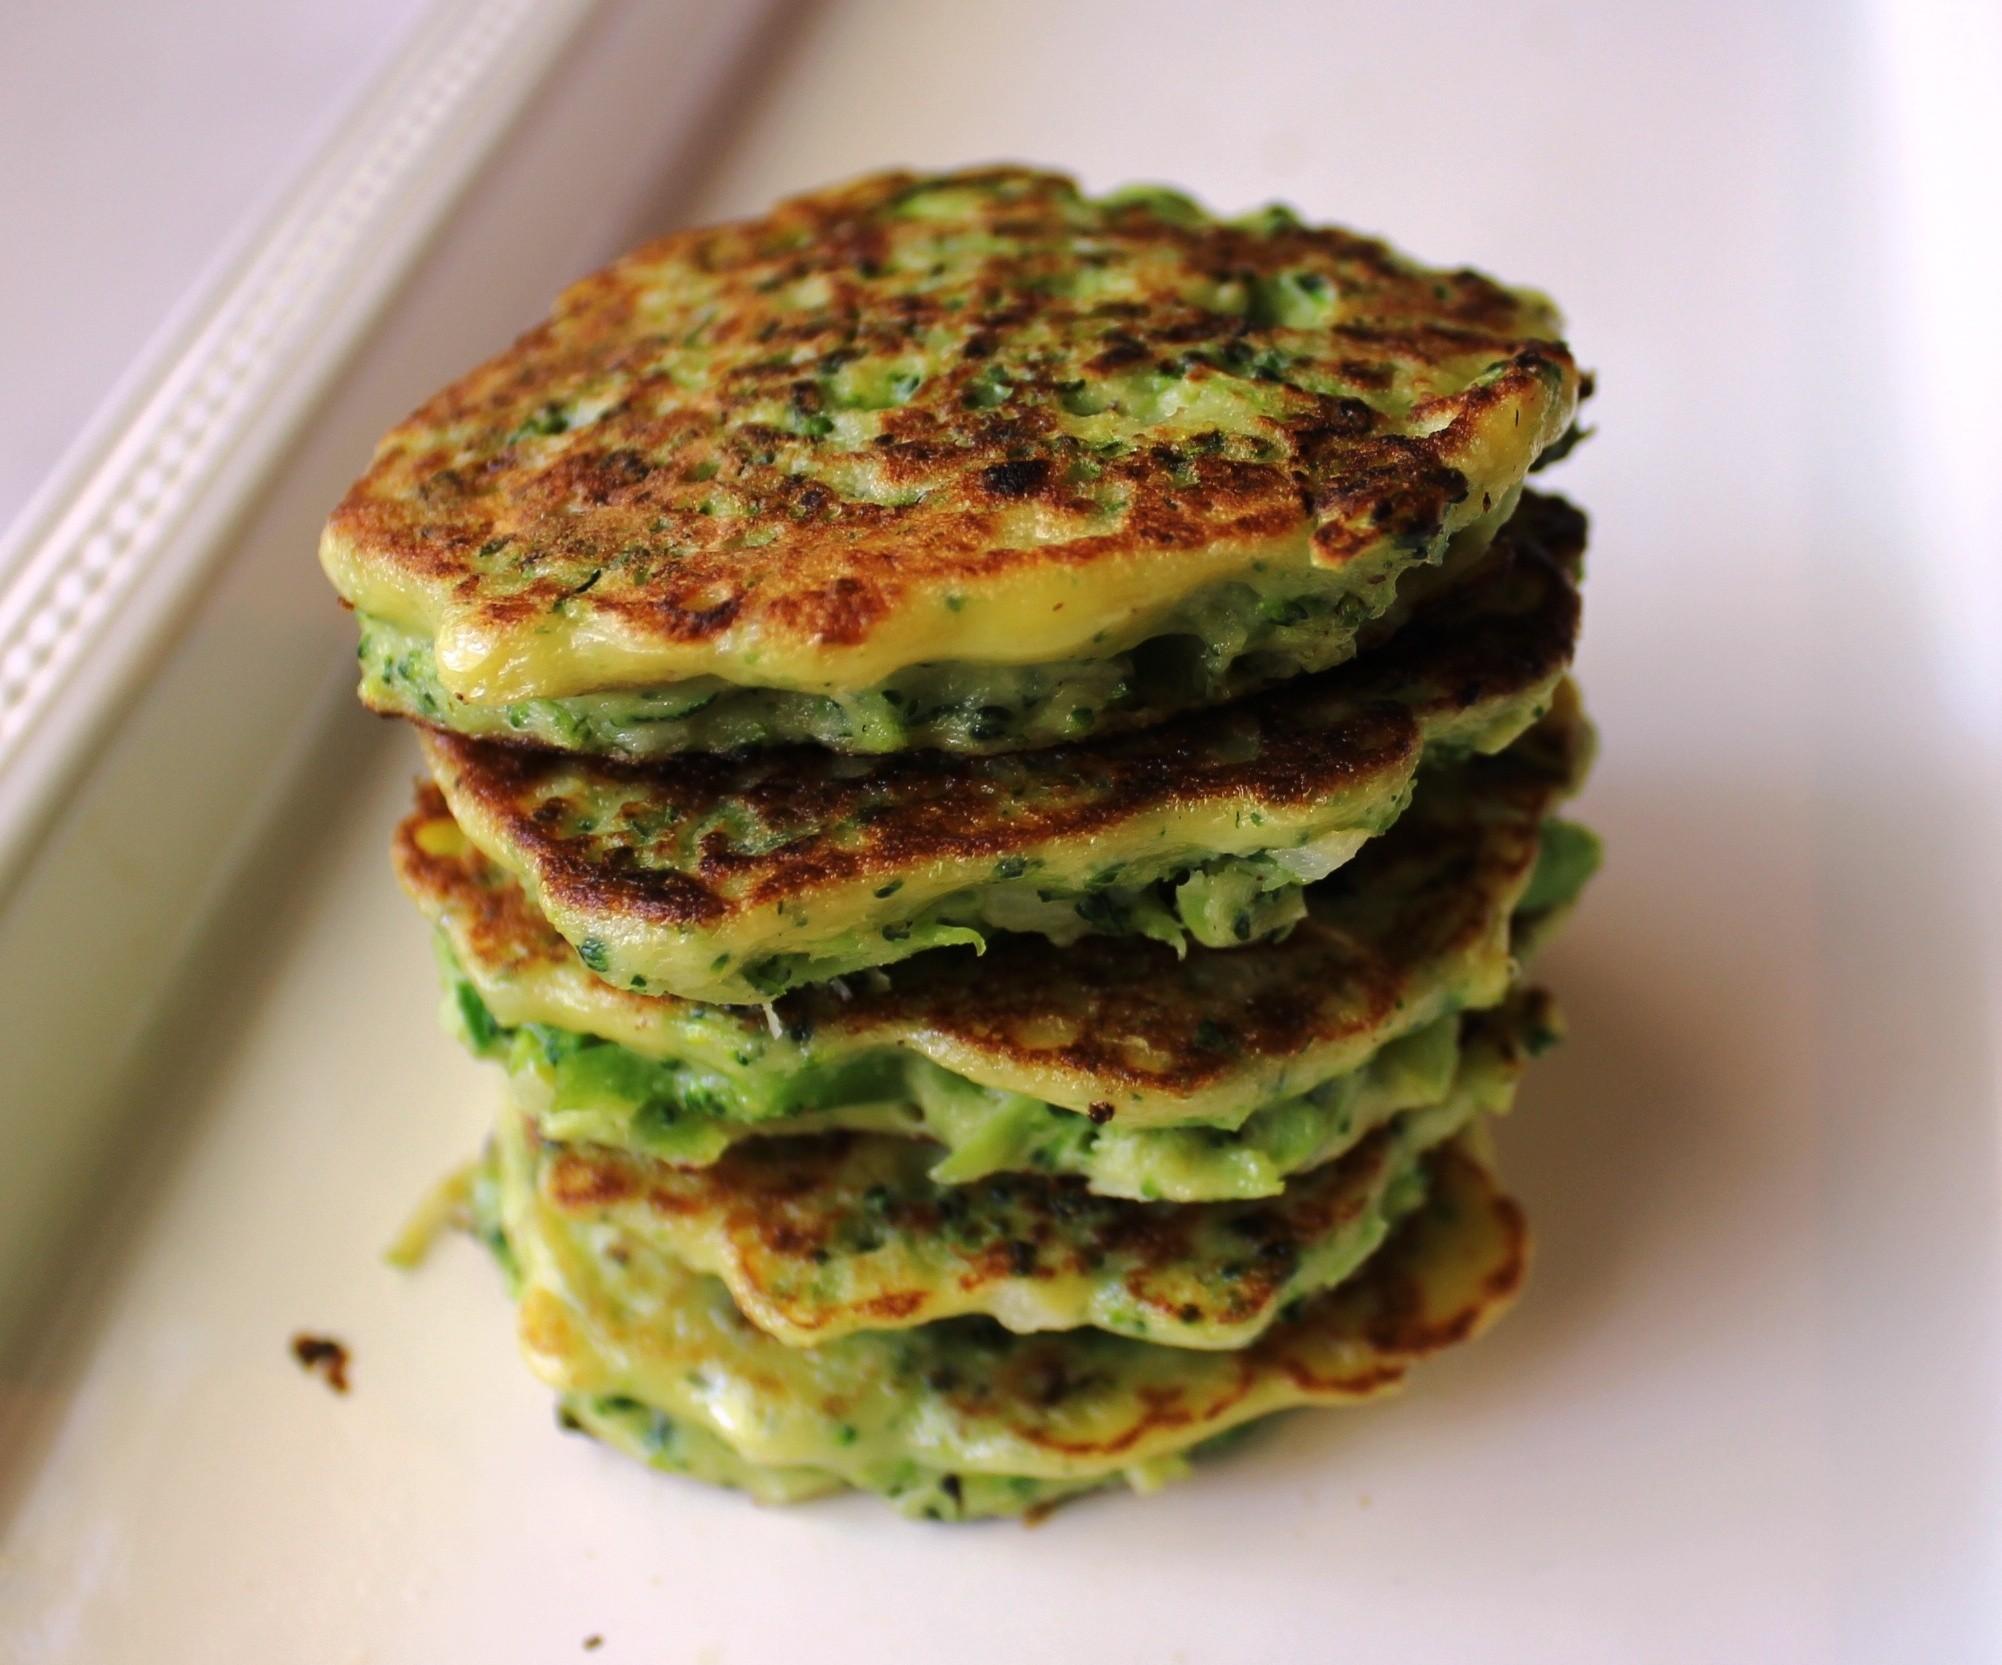 Broccoli and Zucchini Fritters (Gluten-Free, Dairy-Free)